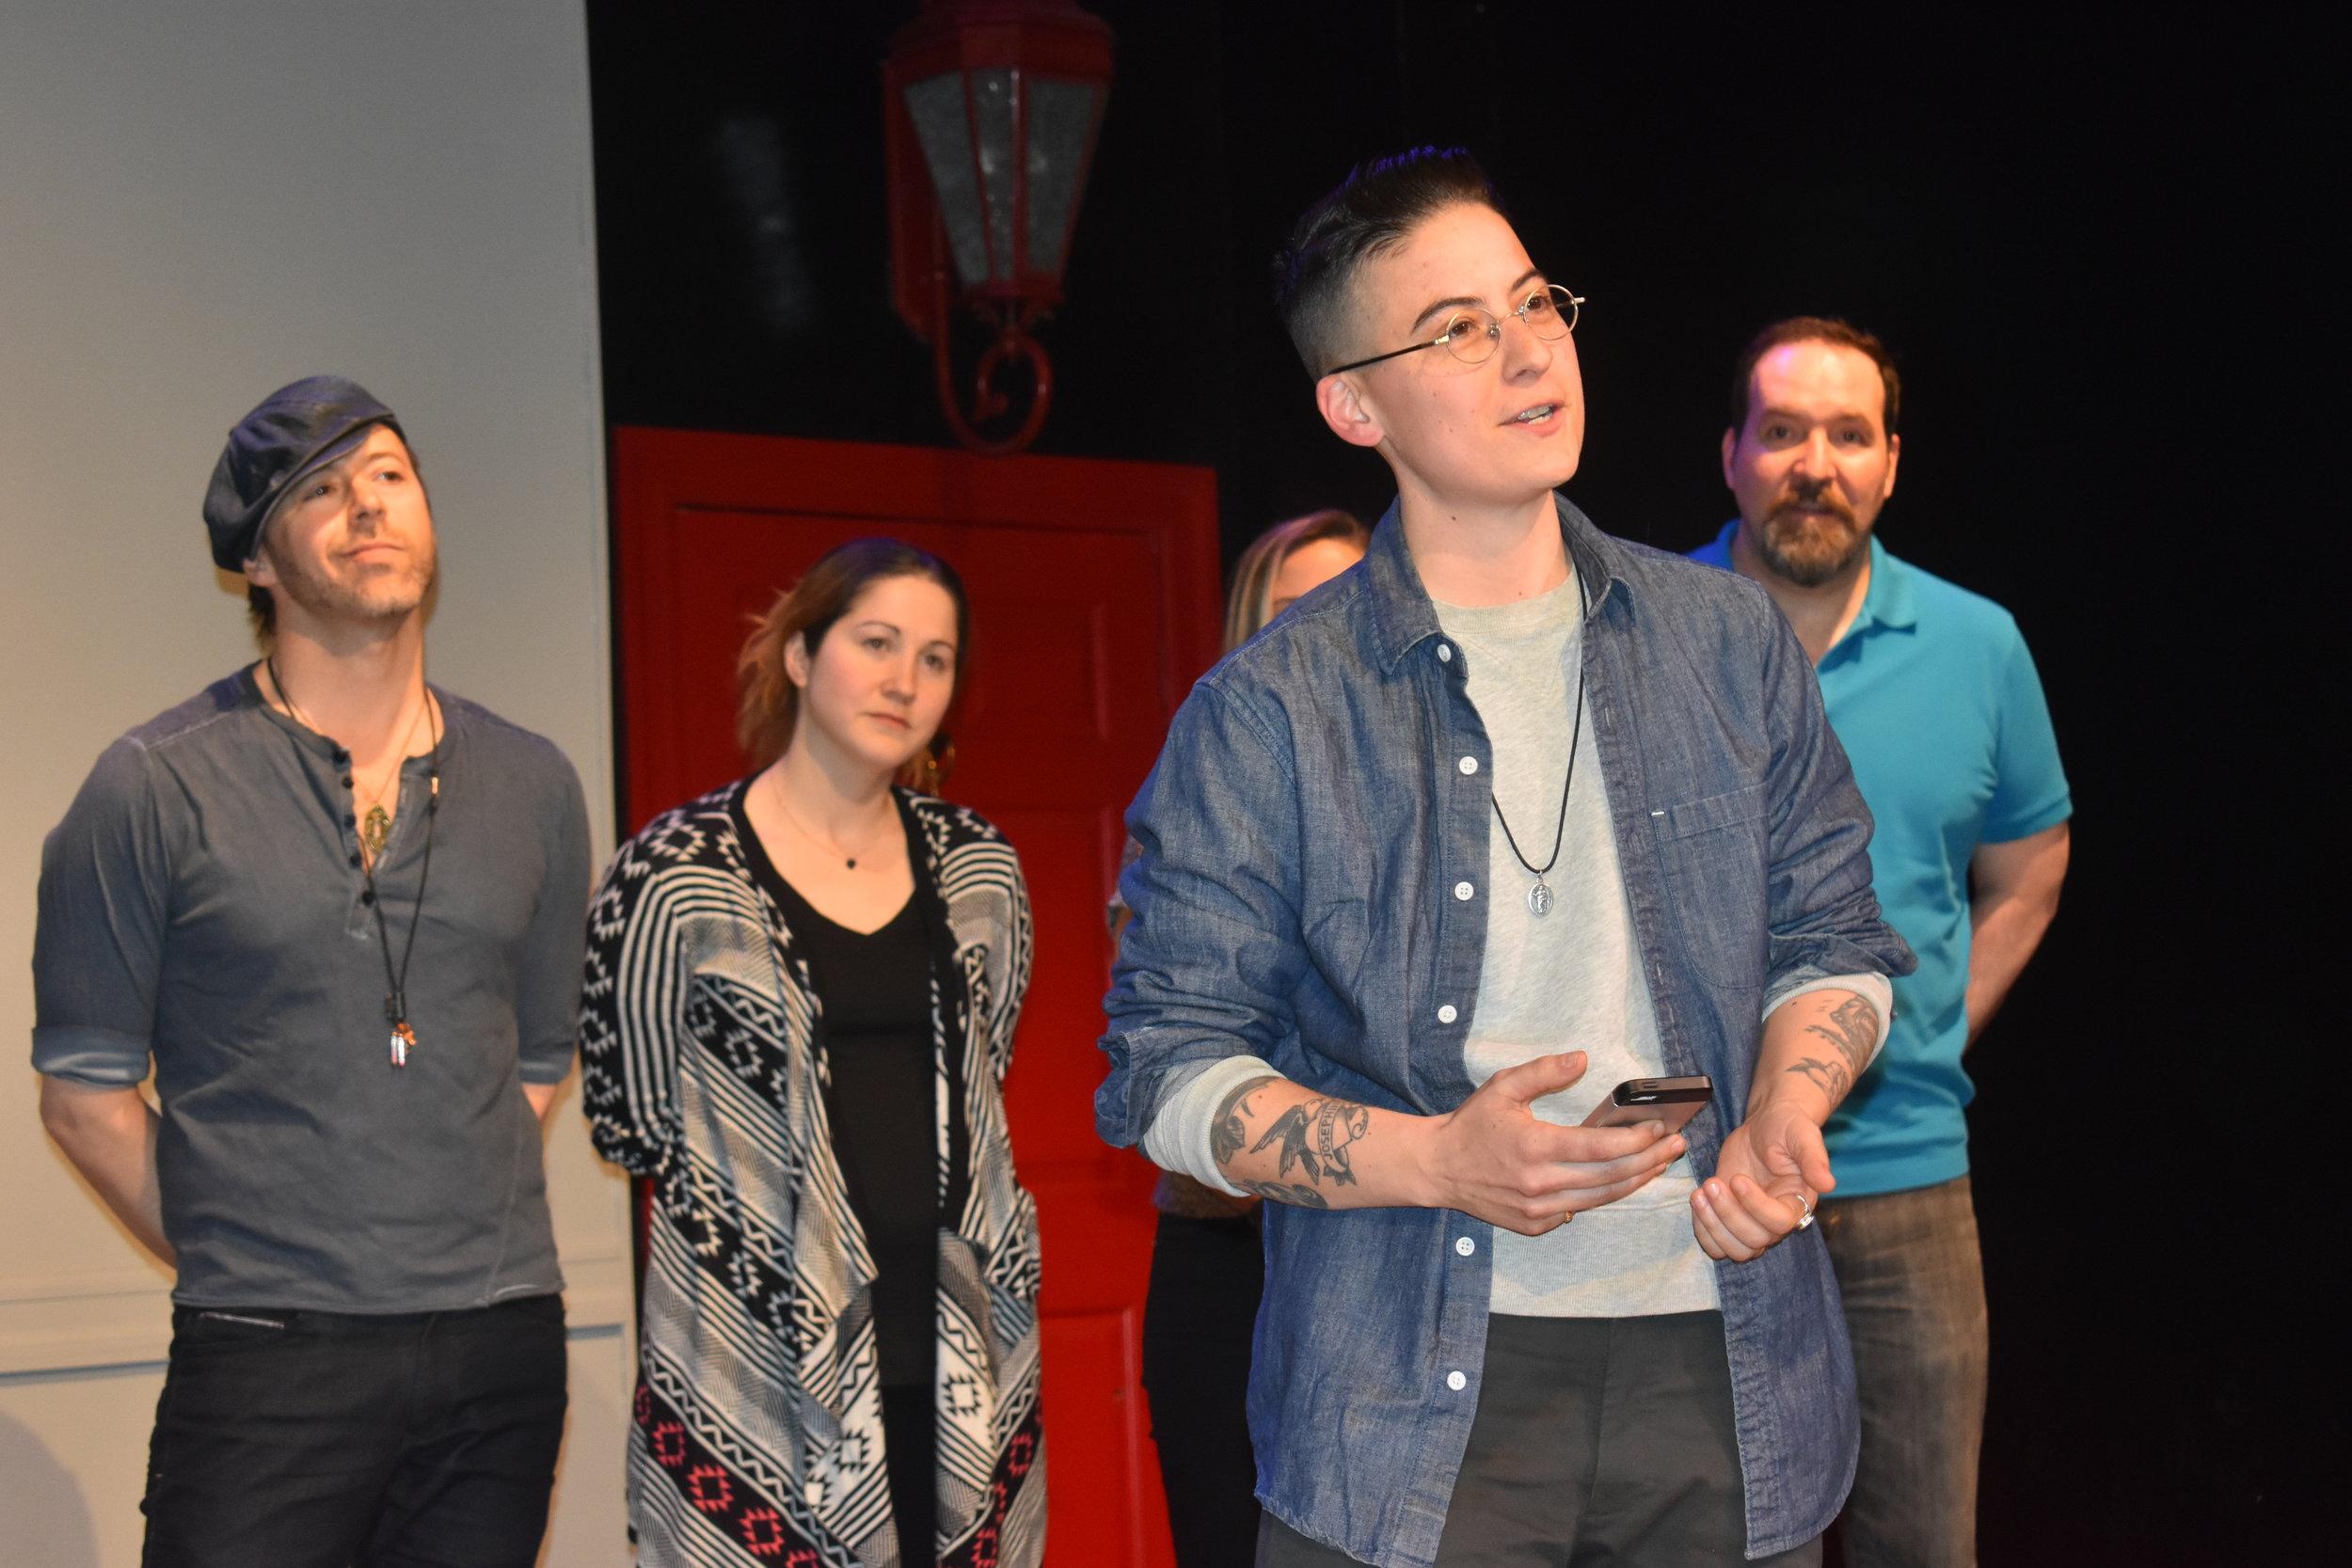 Trans clothier Rae Tutera tells their story. Photo by Layla Zami